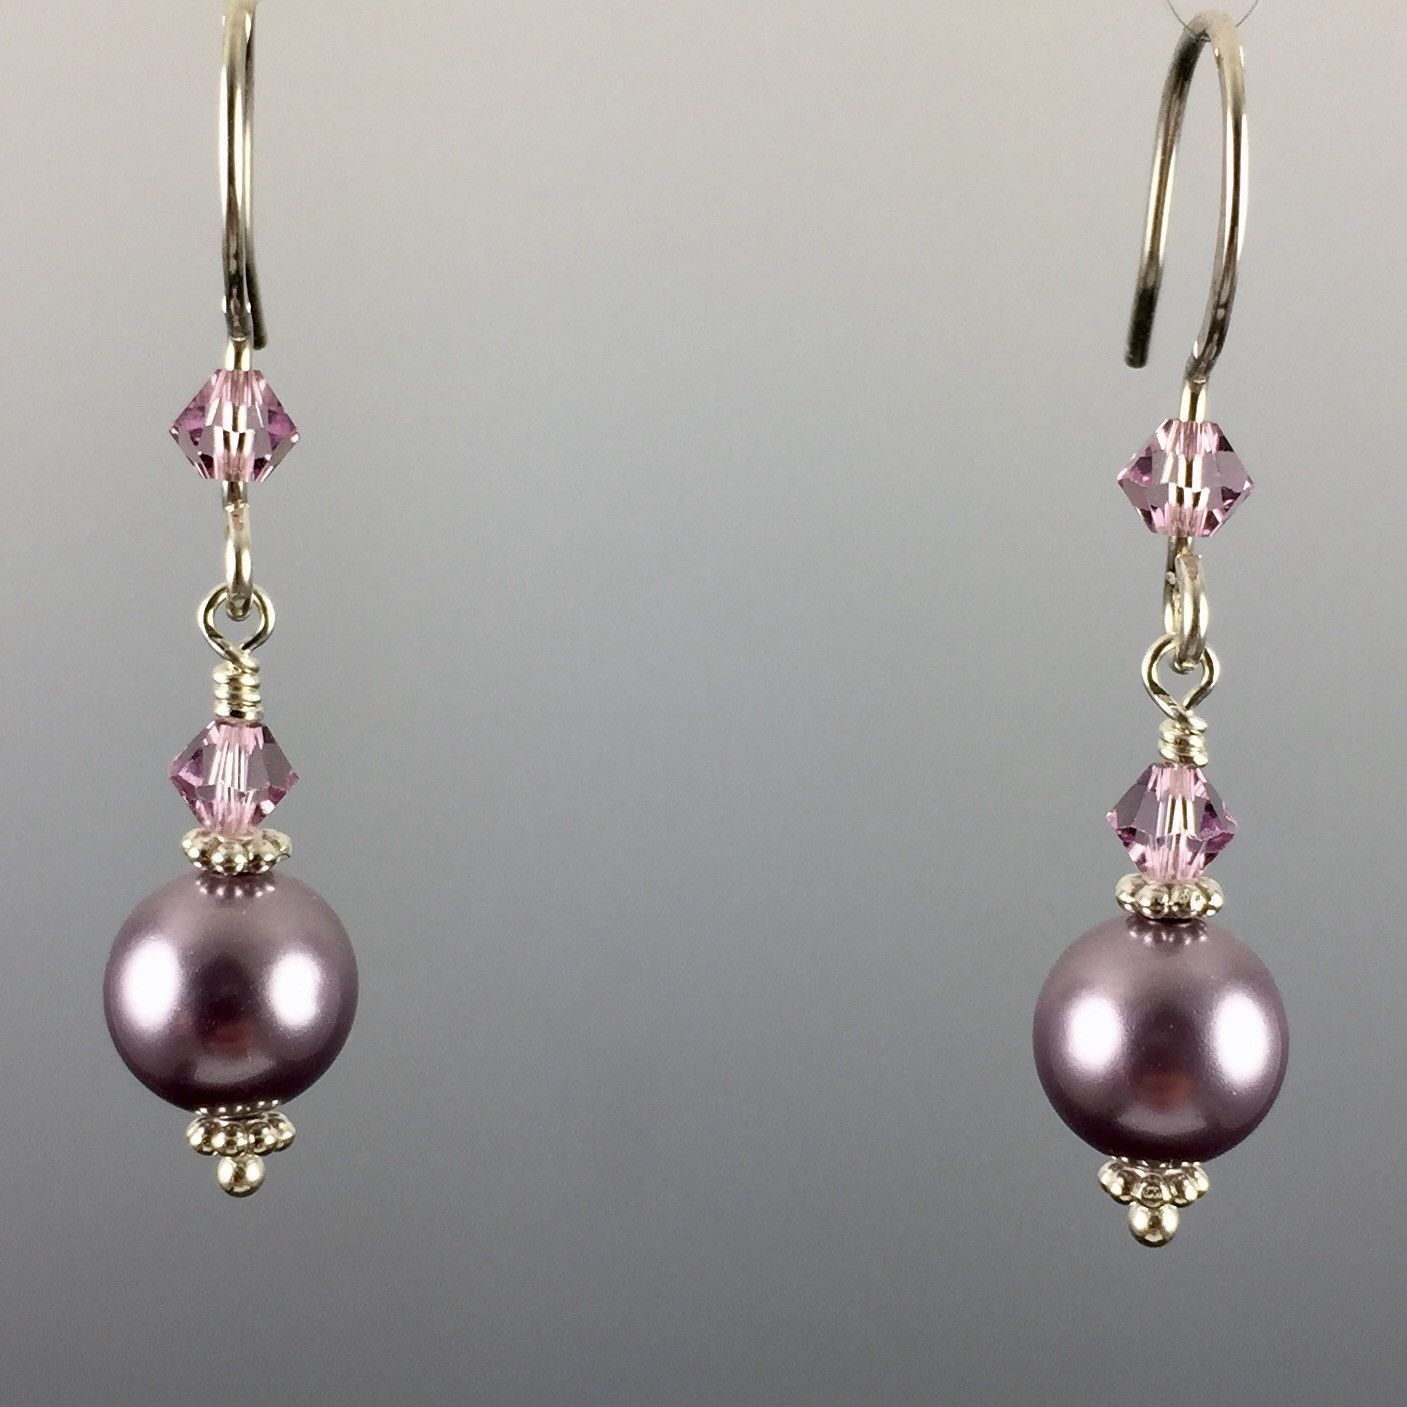 Mauve Swarovski Crystal Pearls & Swarovski Crystal Simple Drop Earrings - 8mm